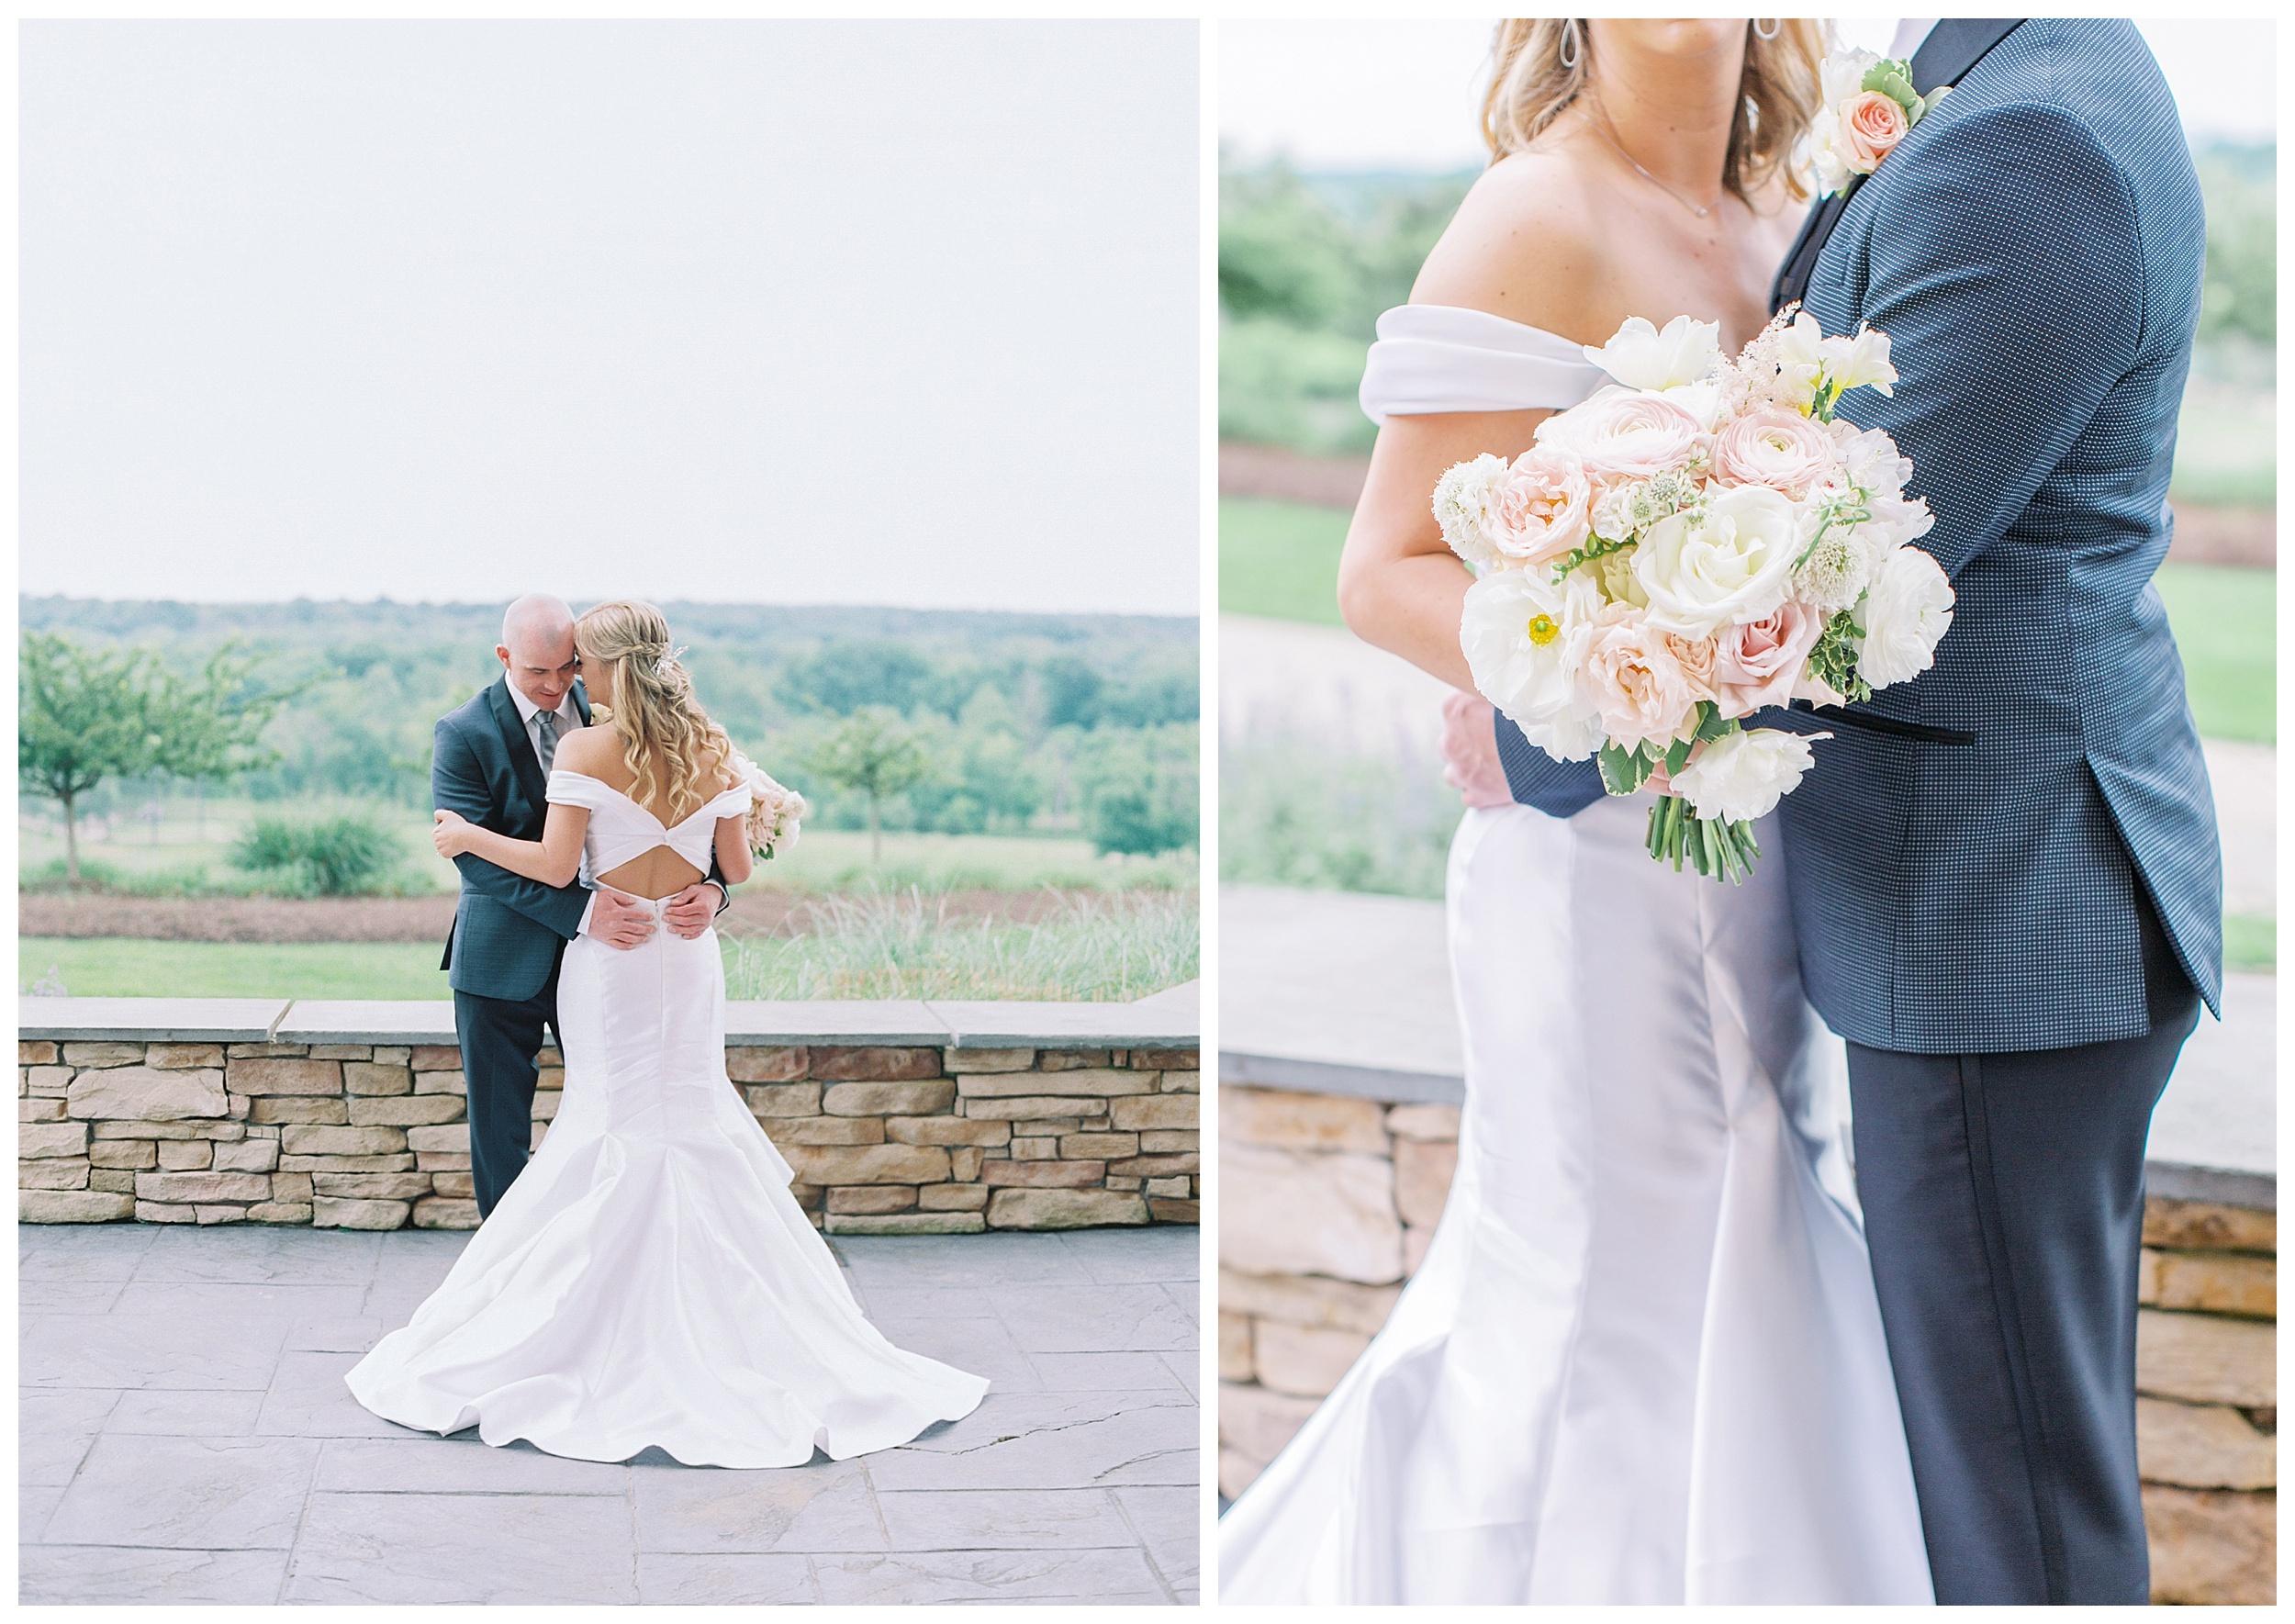 Lansdowne Resort Wedding | Virginia Film Wedding Photographer Kir Tuben_0036.jpg